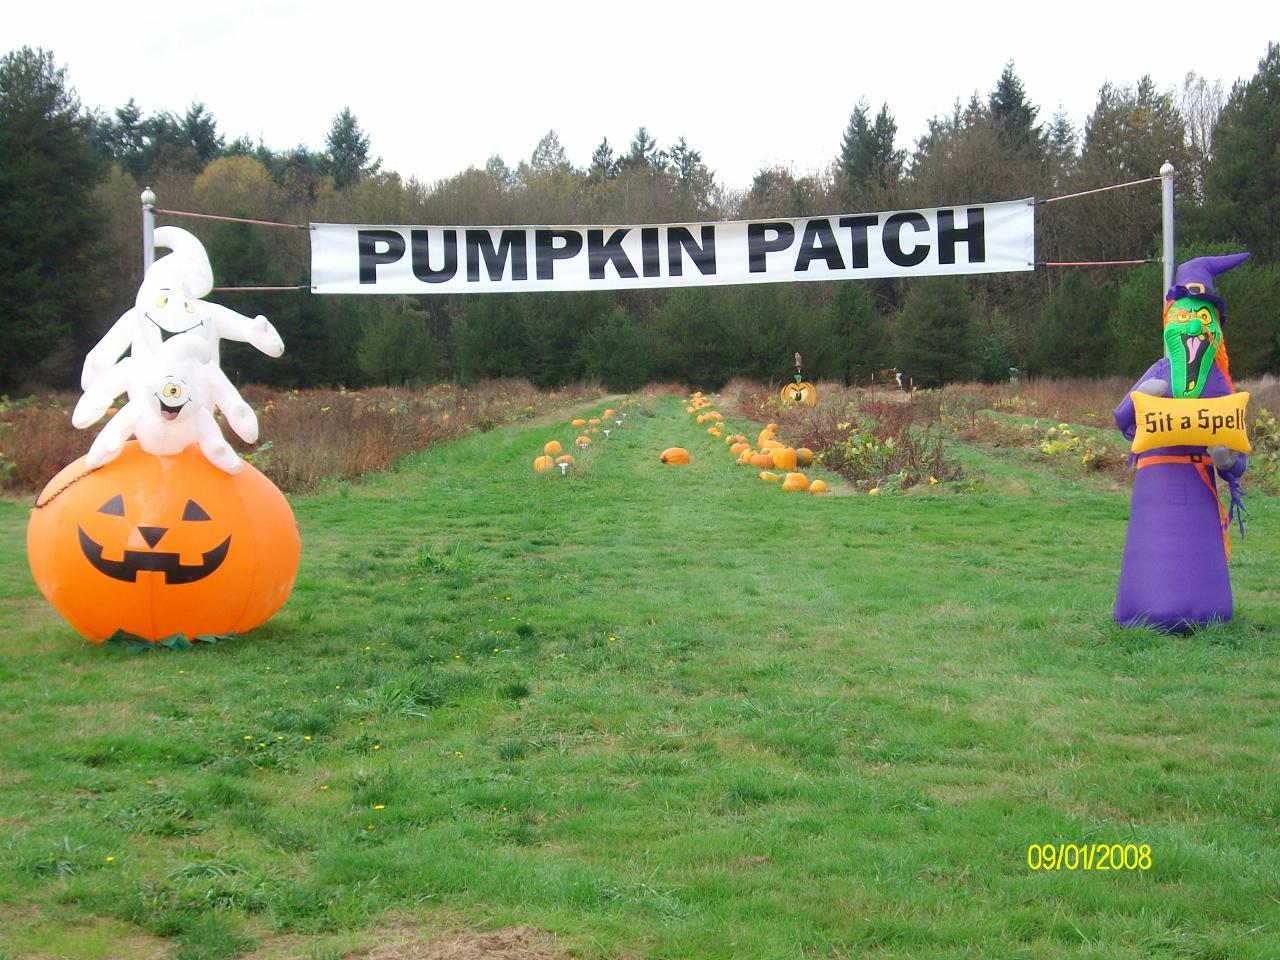 Toledo area of ohio pumpkin patches, corn mazes, hayrides and more.